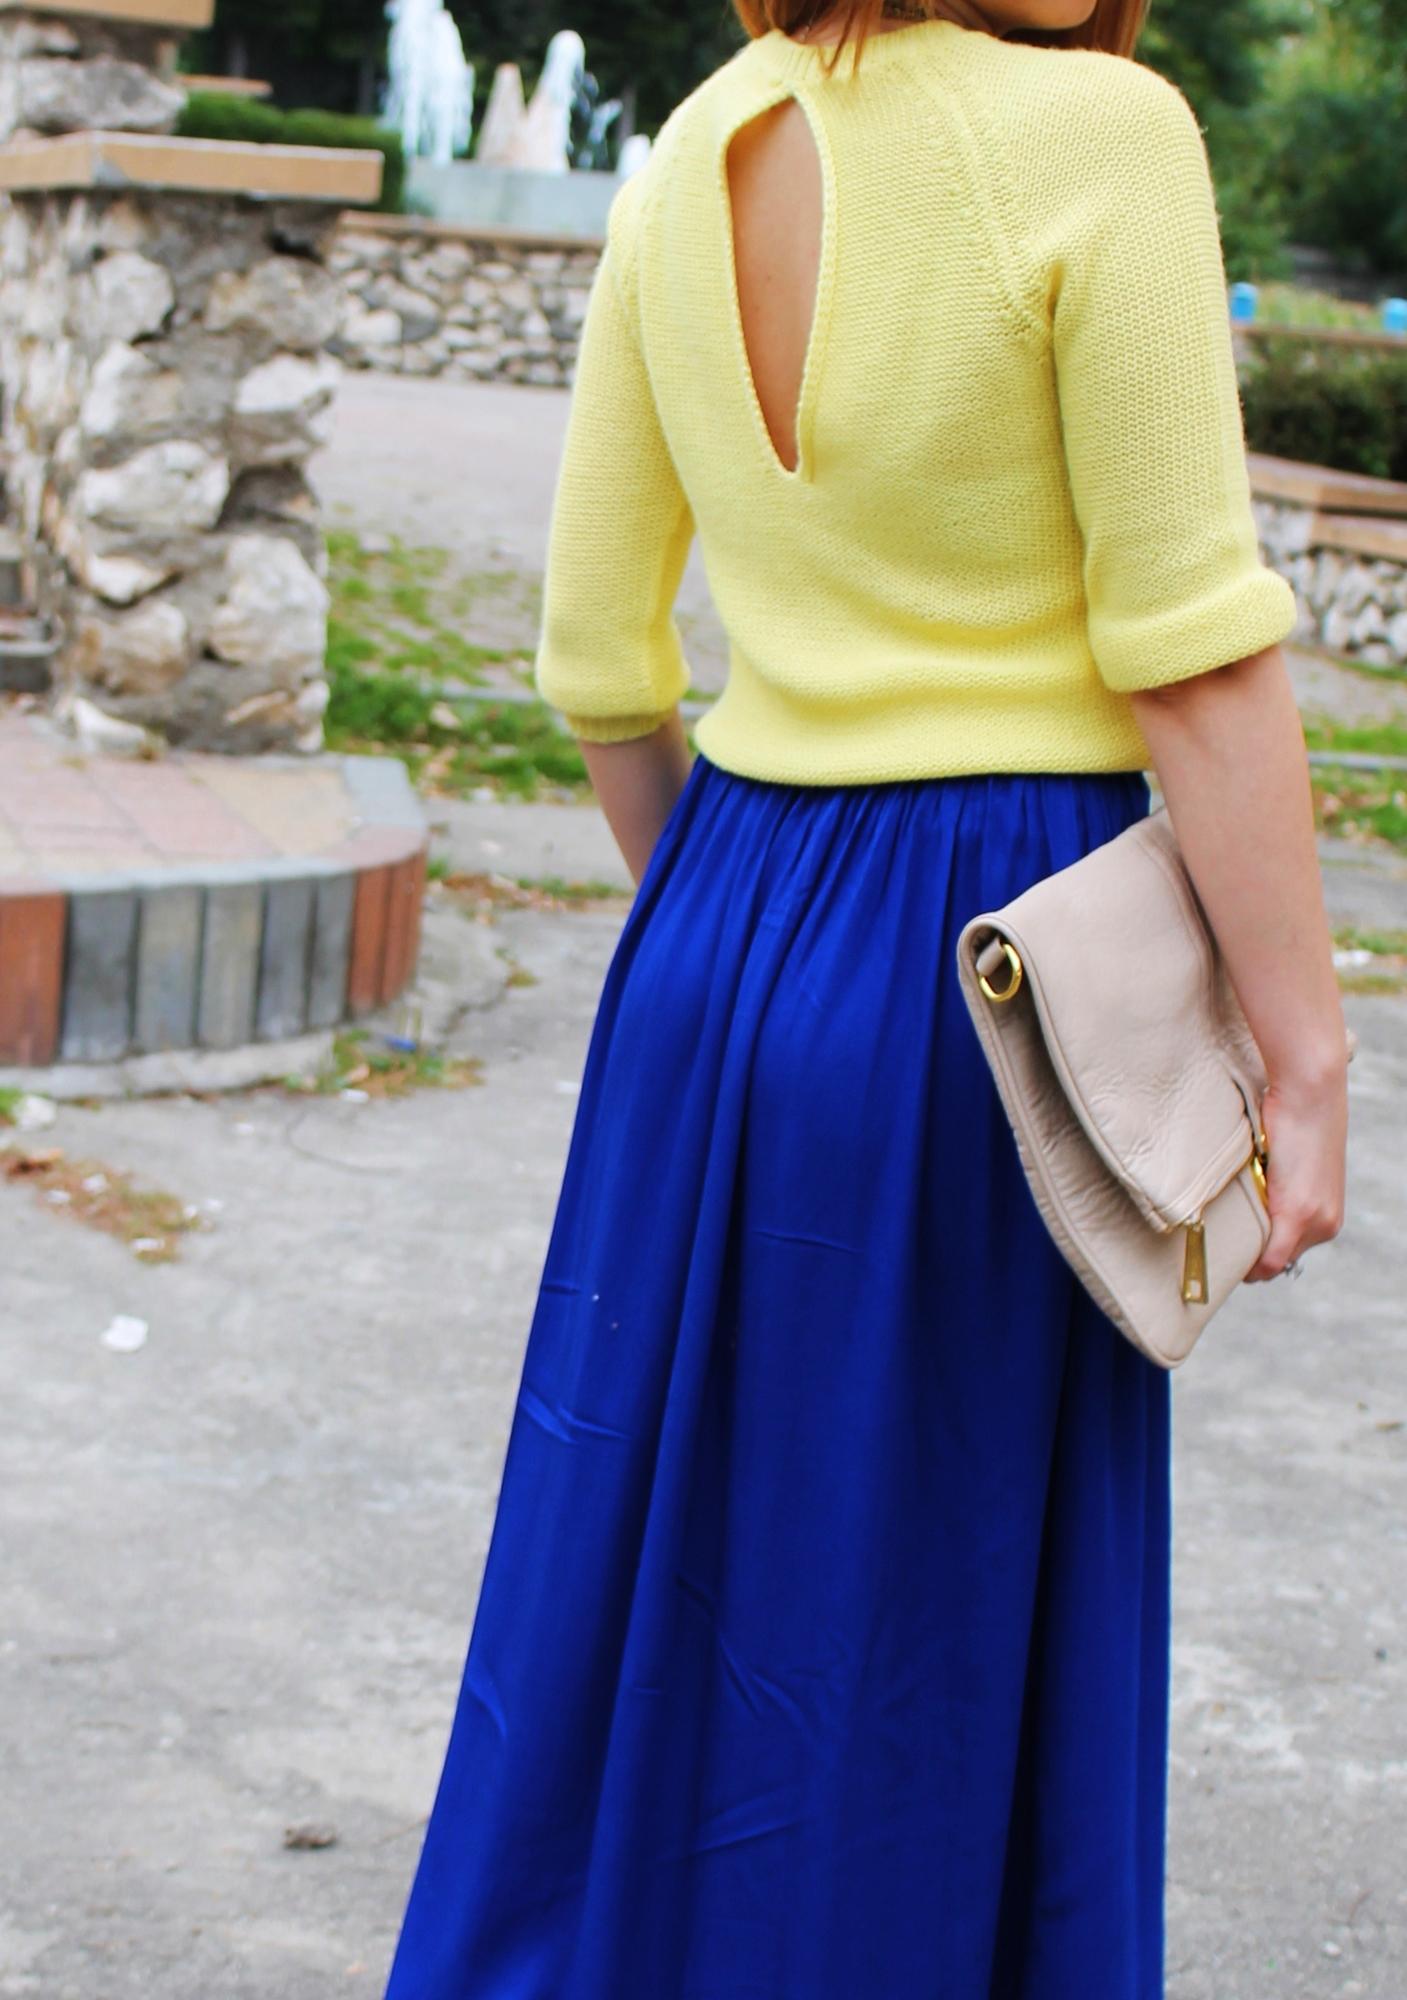 pulover zara spatele gol, fusta albastra lunga